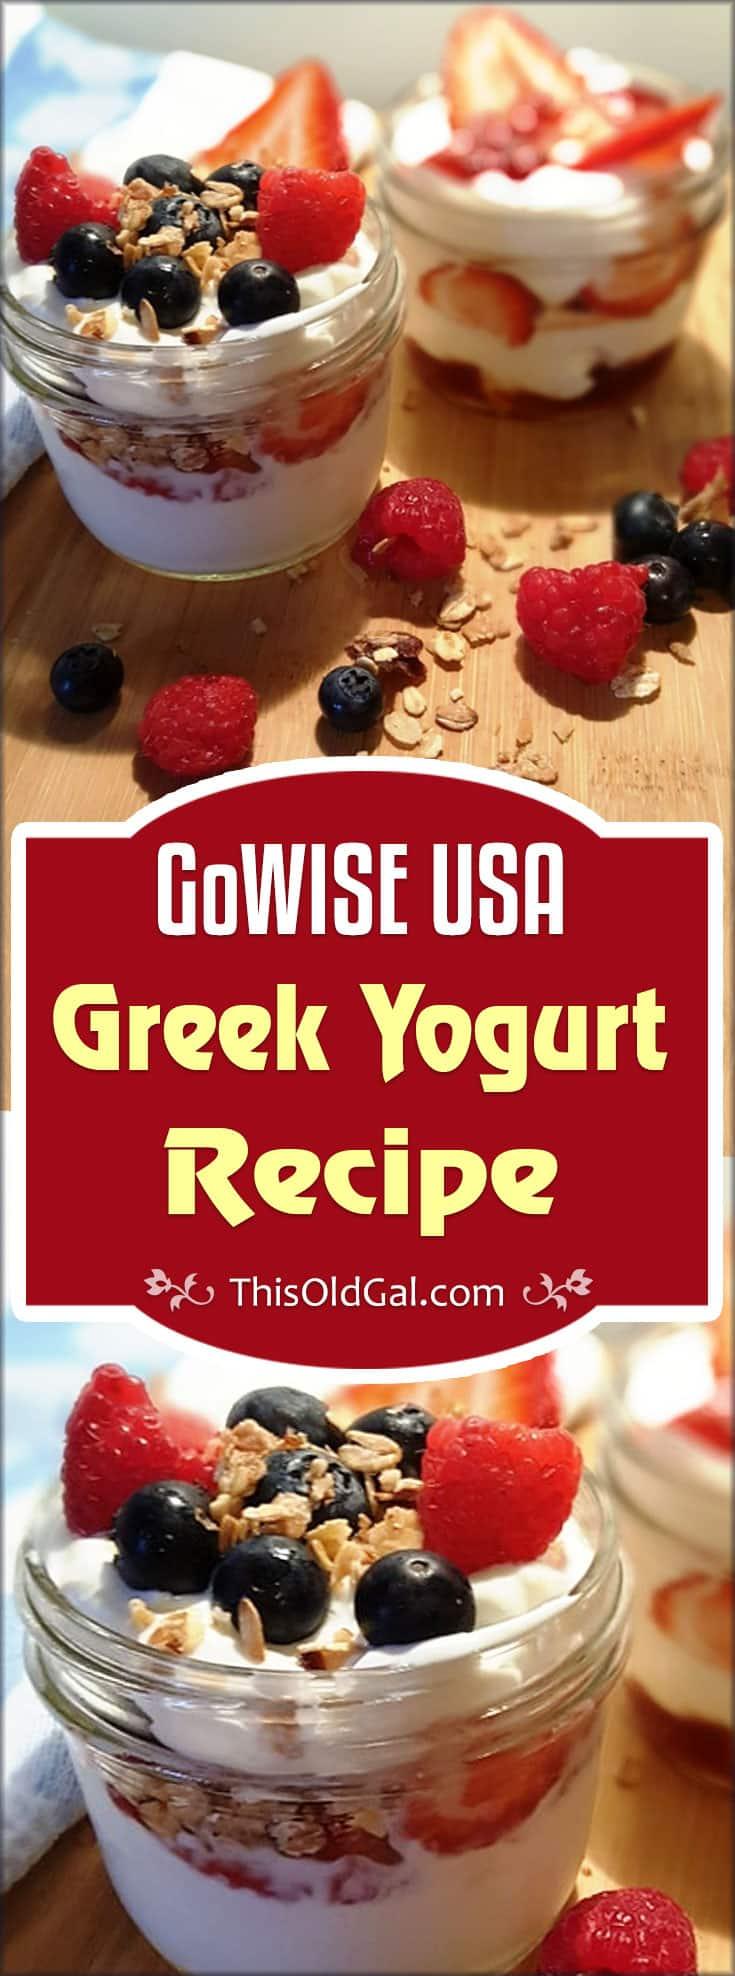 GoWISE USA Greek Yogurt Recipe (Regular Yogurt Too!)